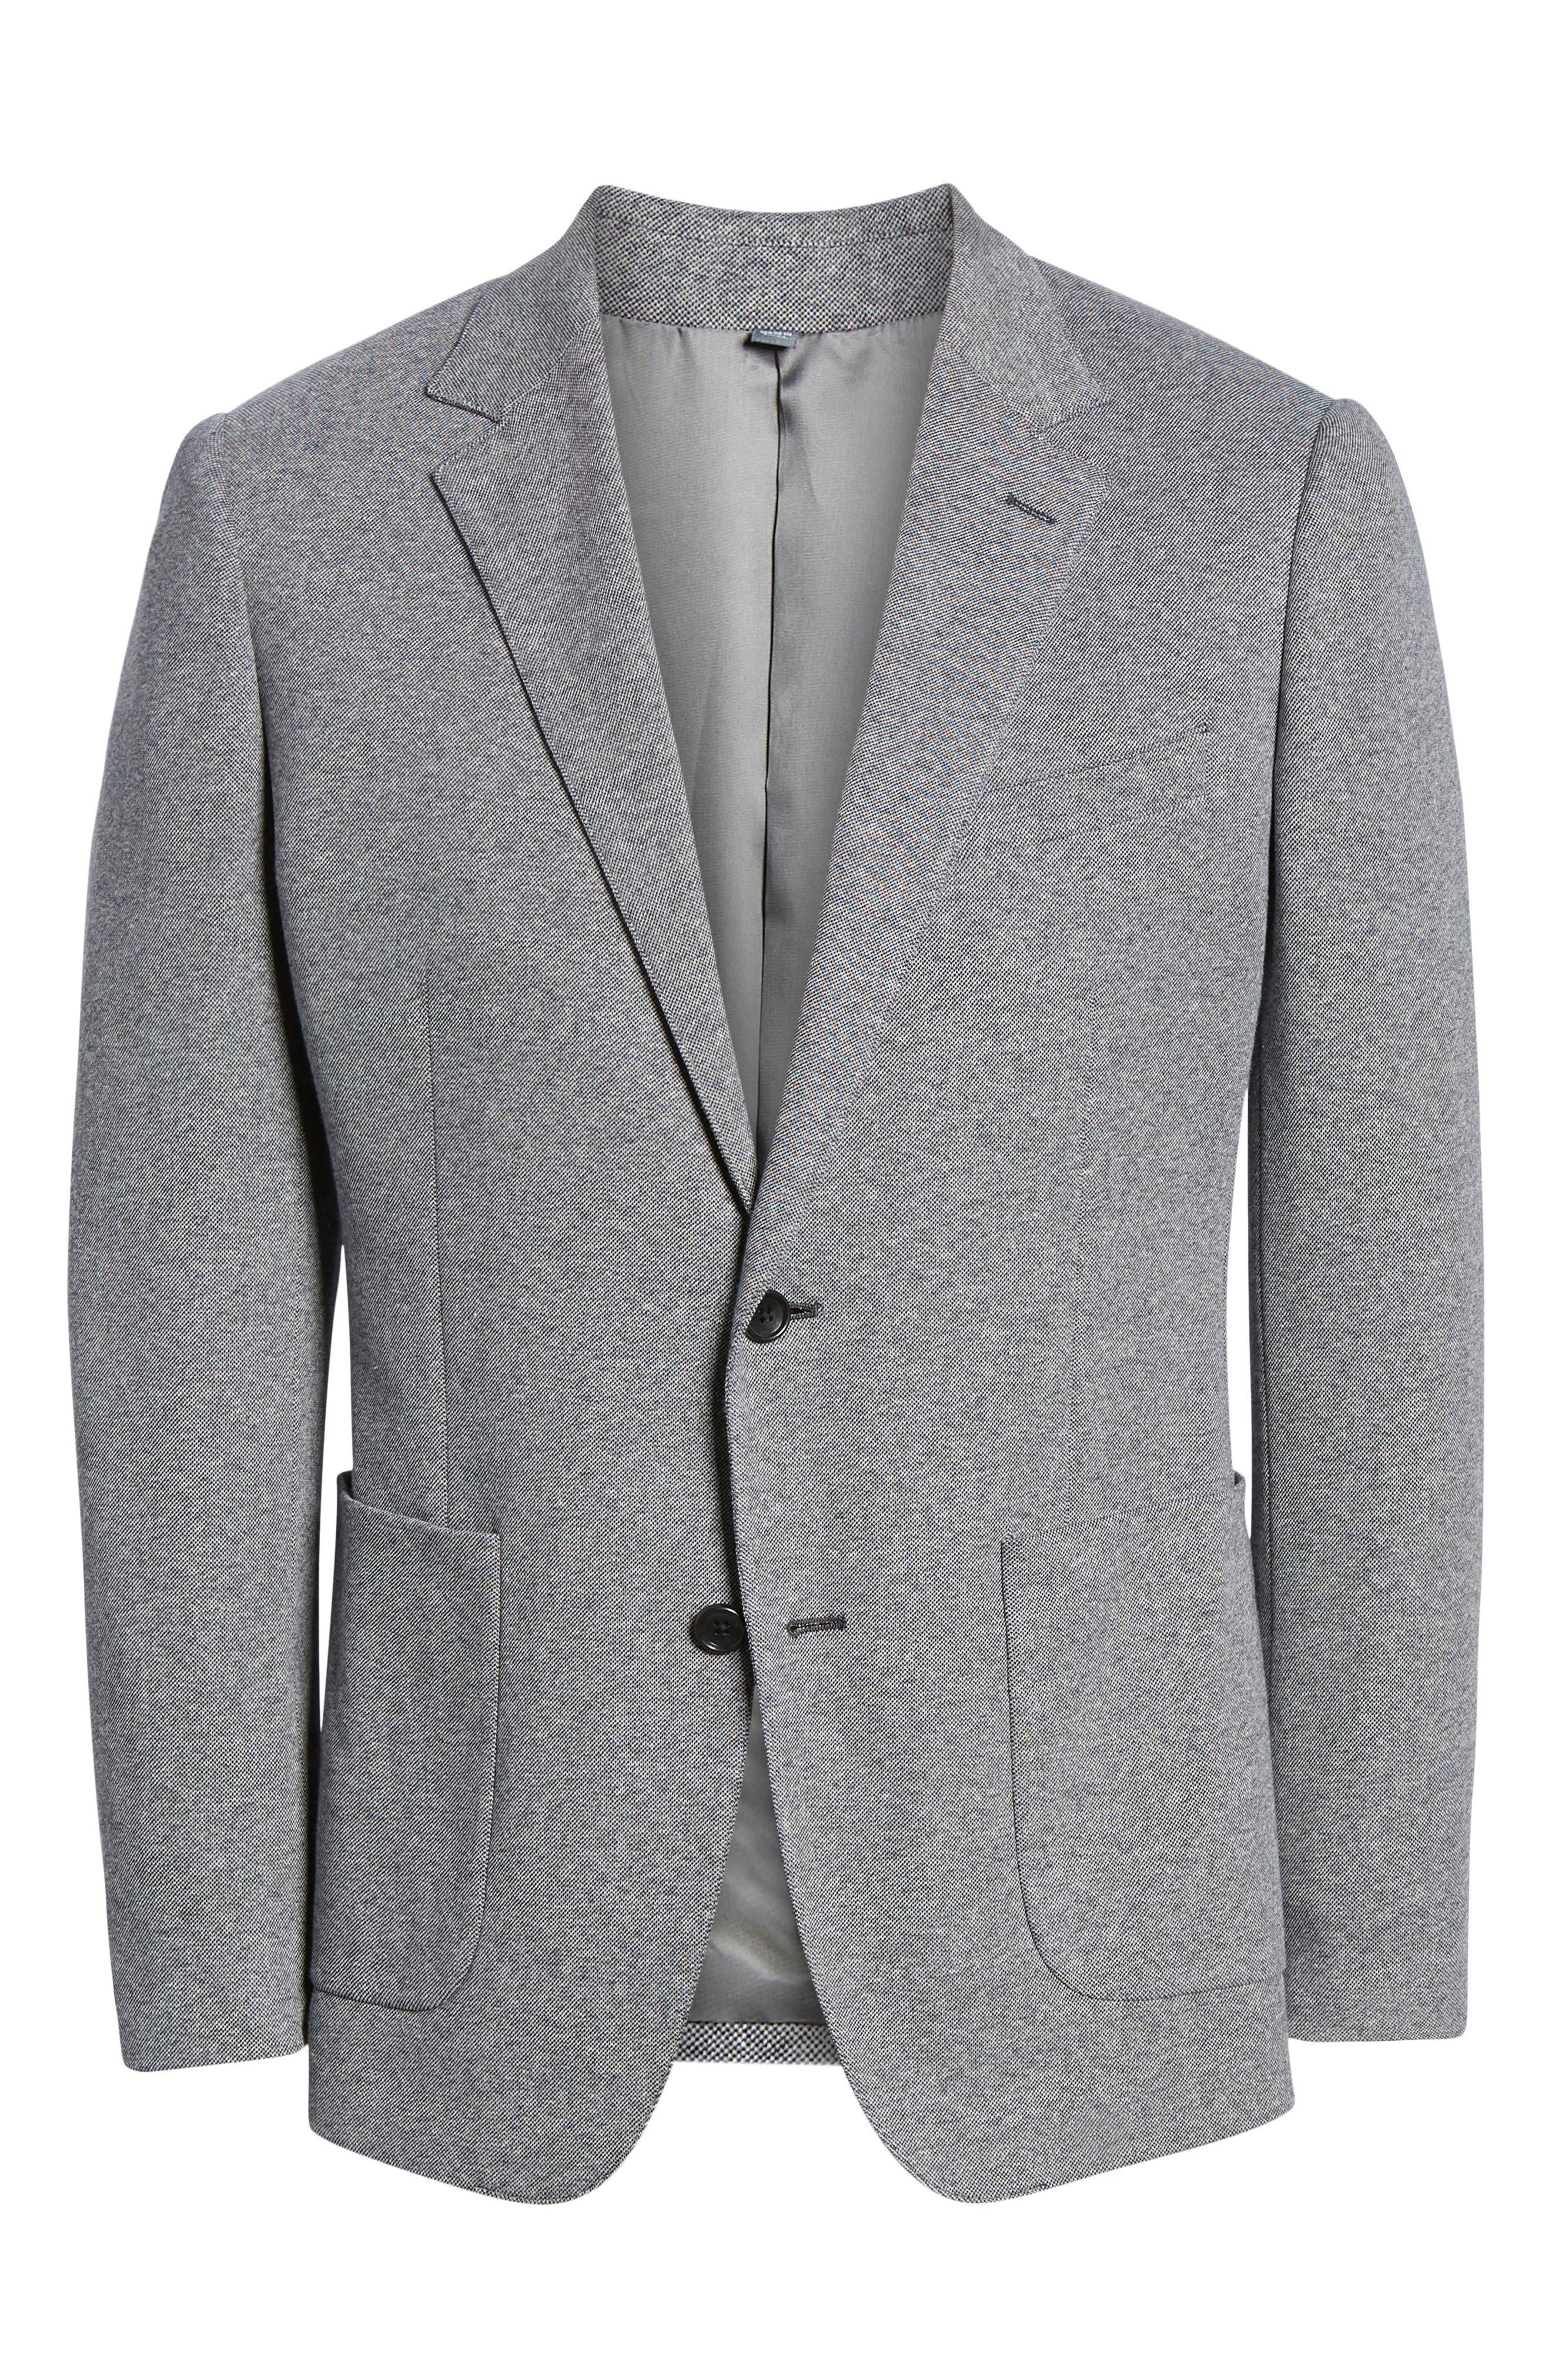 BONOBOS, Jetsetter Slim Fit Knit Cotton Sport Coat, Alternate thumbnail 6, color, LIGHT GREY